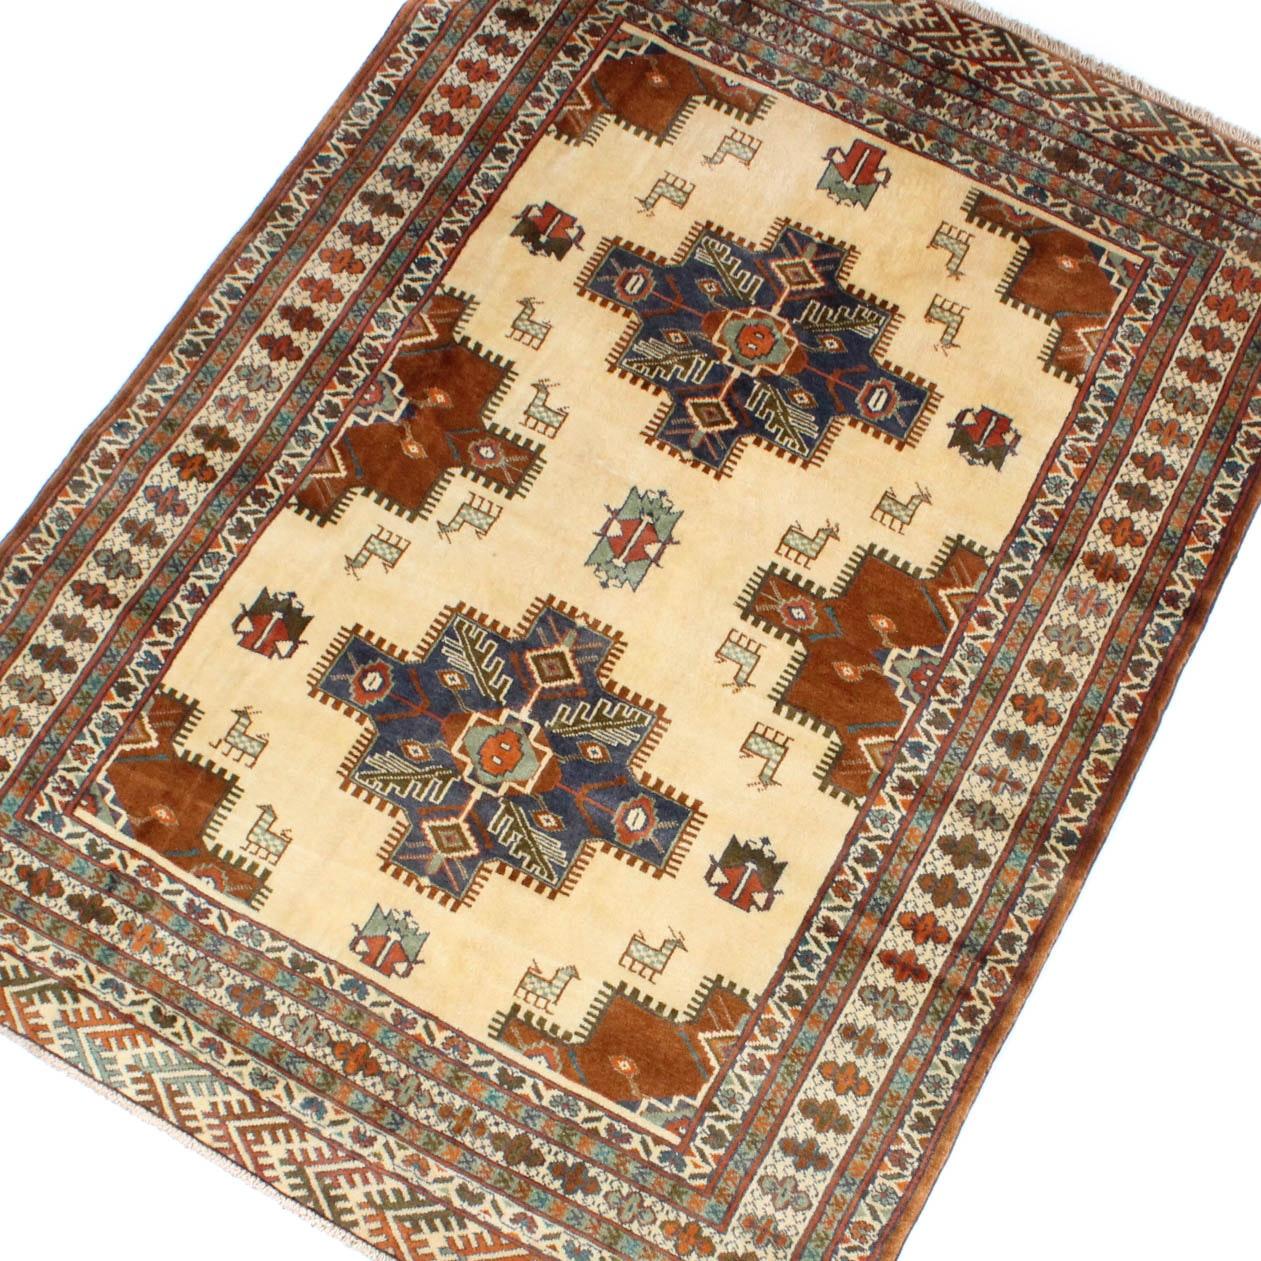 5' x 7' Vintage Hand-Knotted Persian Karaja Heriz Area Rug